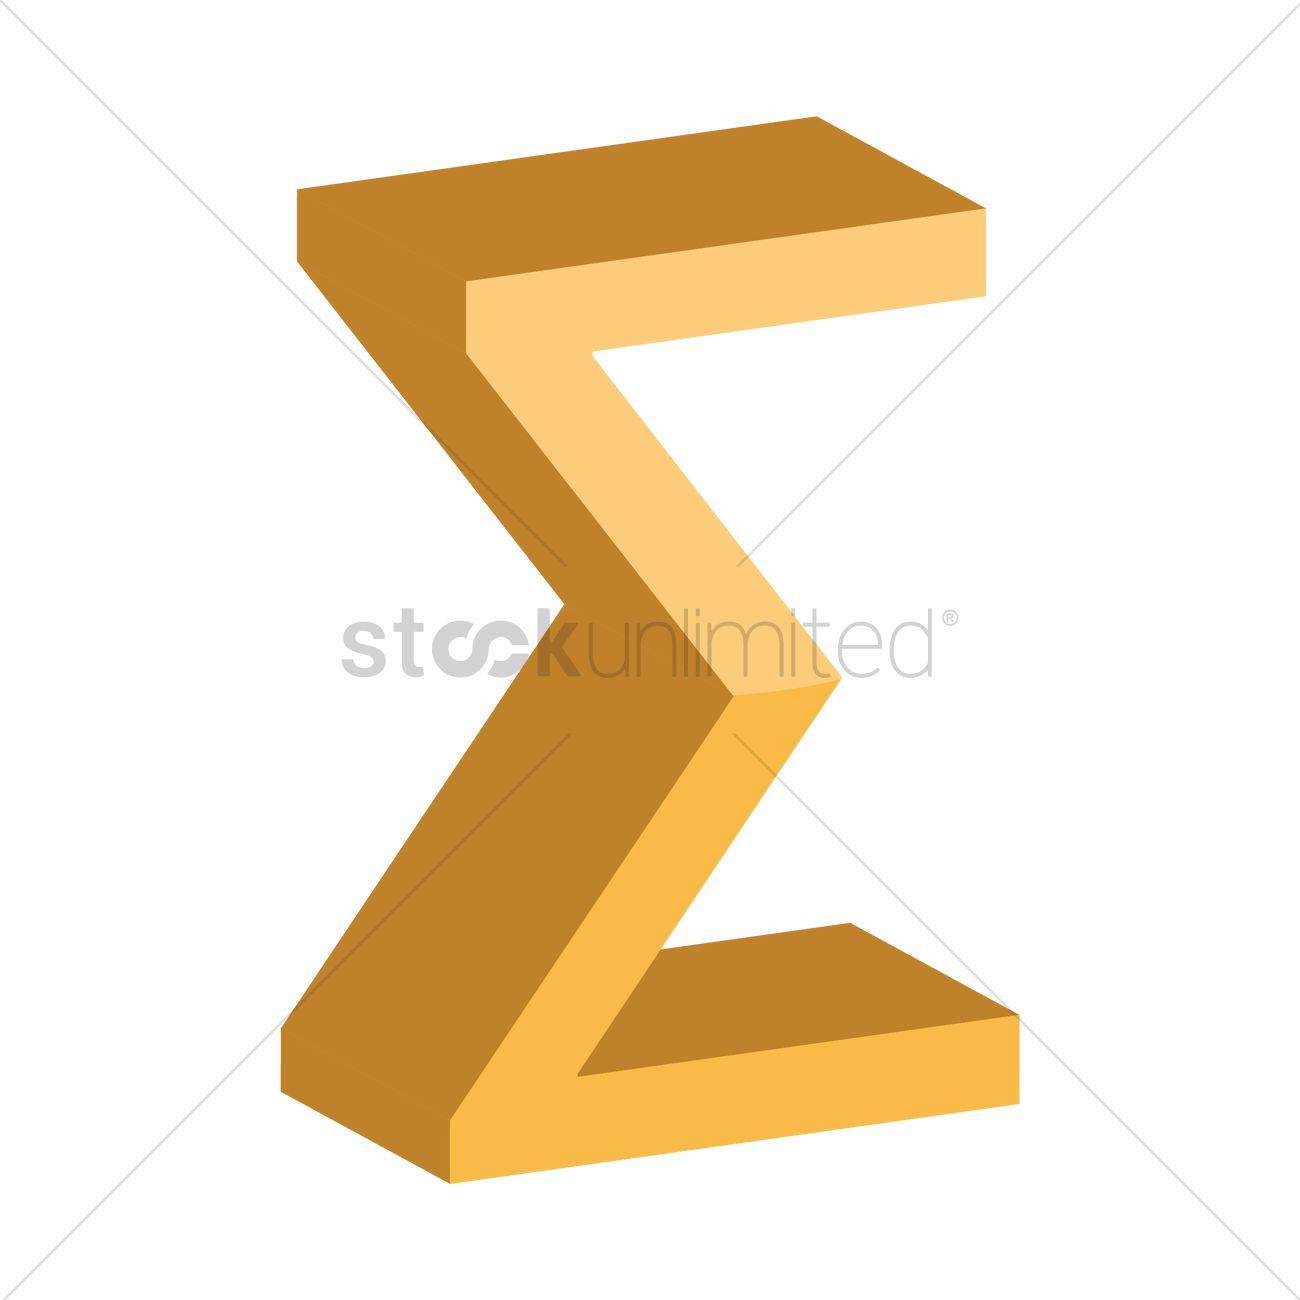 Sigma symbol vector image 1866779 stockunlimited sigma symbol vector graphic biocorpaavc Choice Image